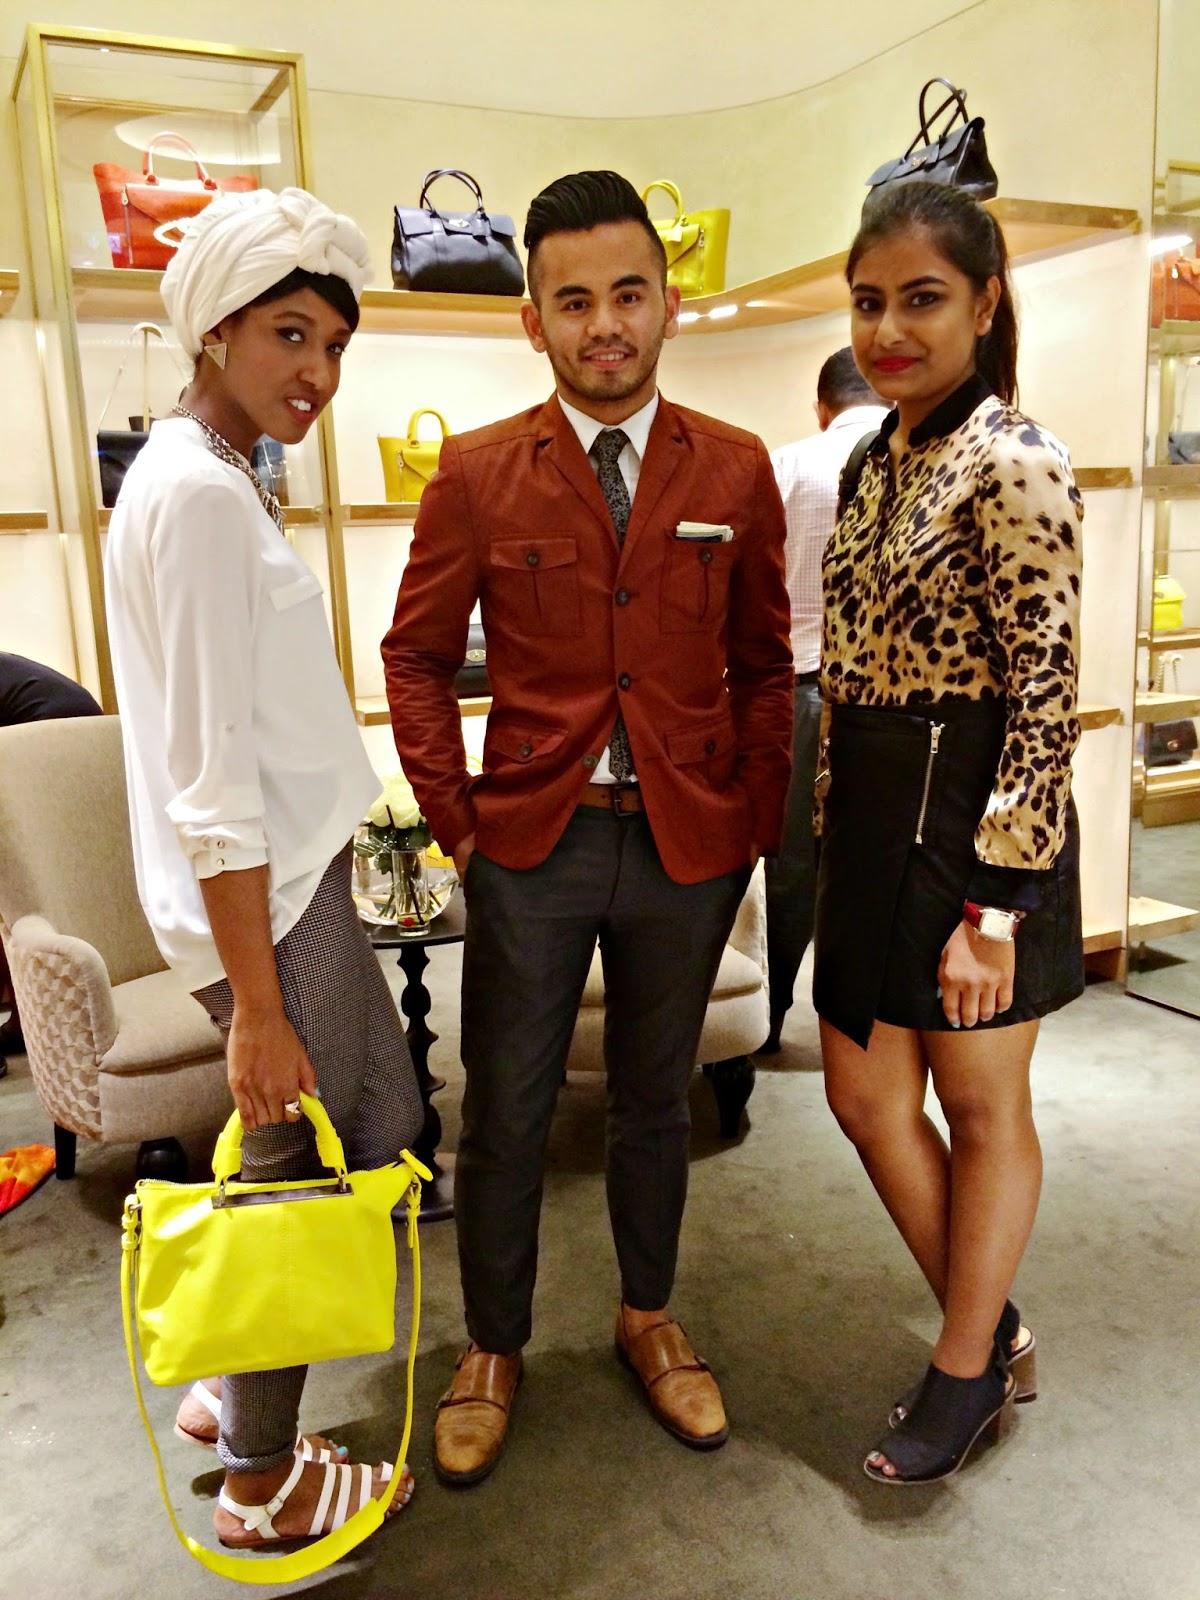 kajol paul, fashion blogger, dubai, fashion, style, the style sorbet